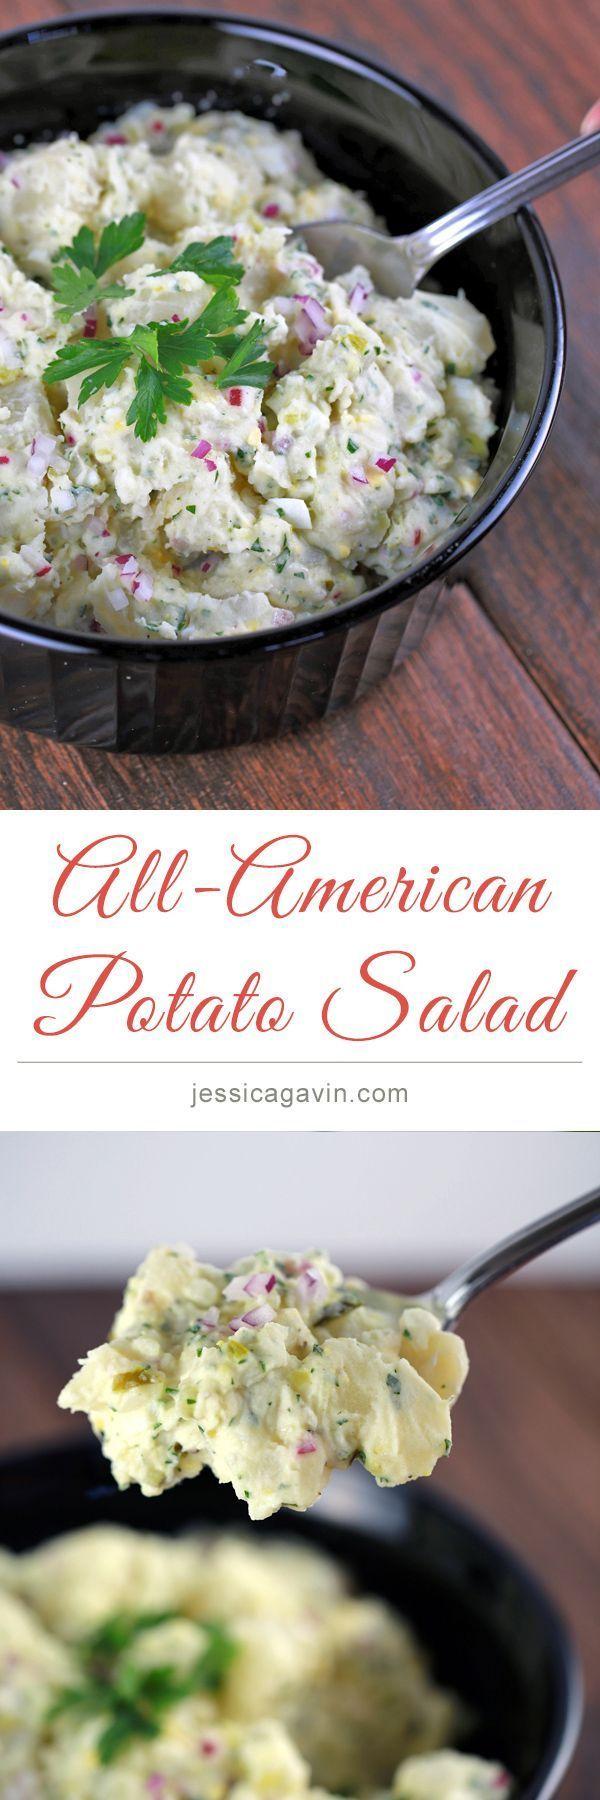 A delicious All-American Potato Salad | jessicagavin.com #potluck #bbq